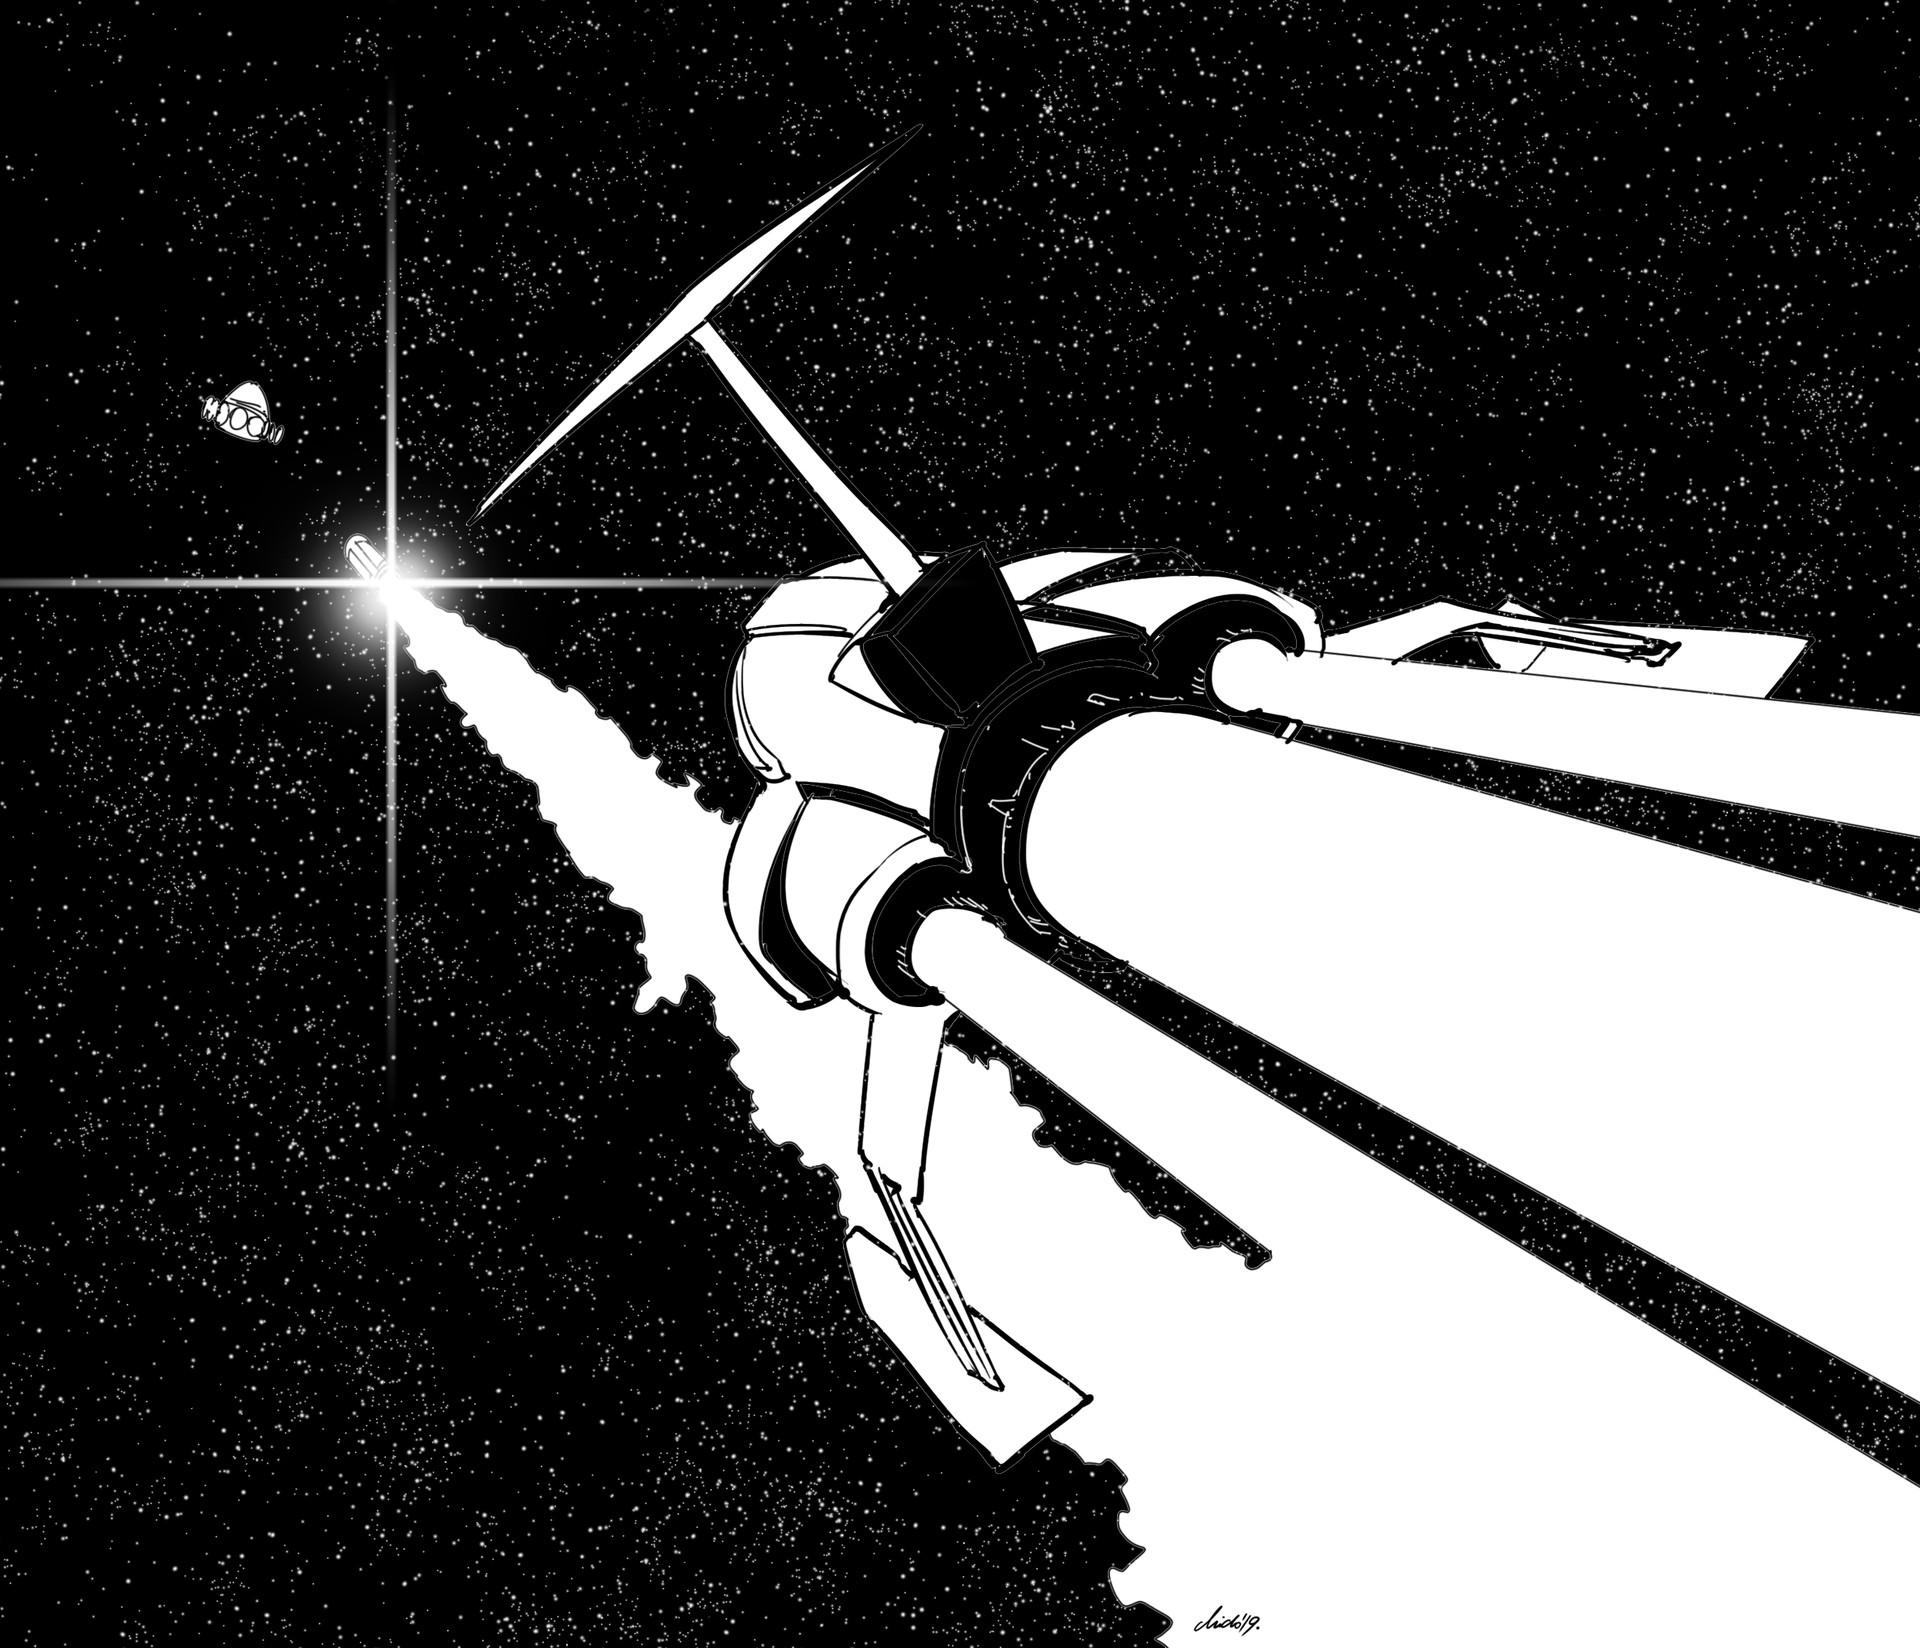 Midhat kapetanovic ufo interceptor